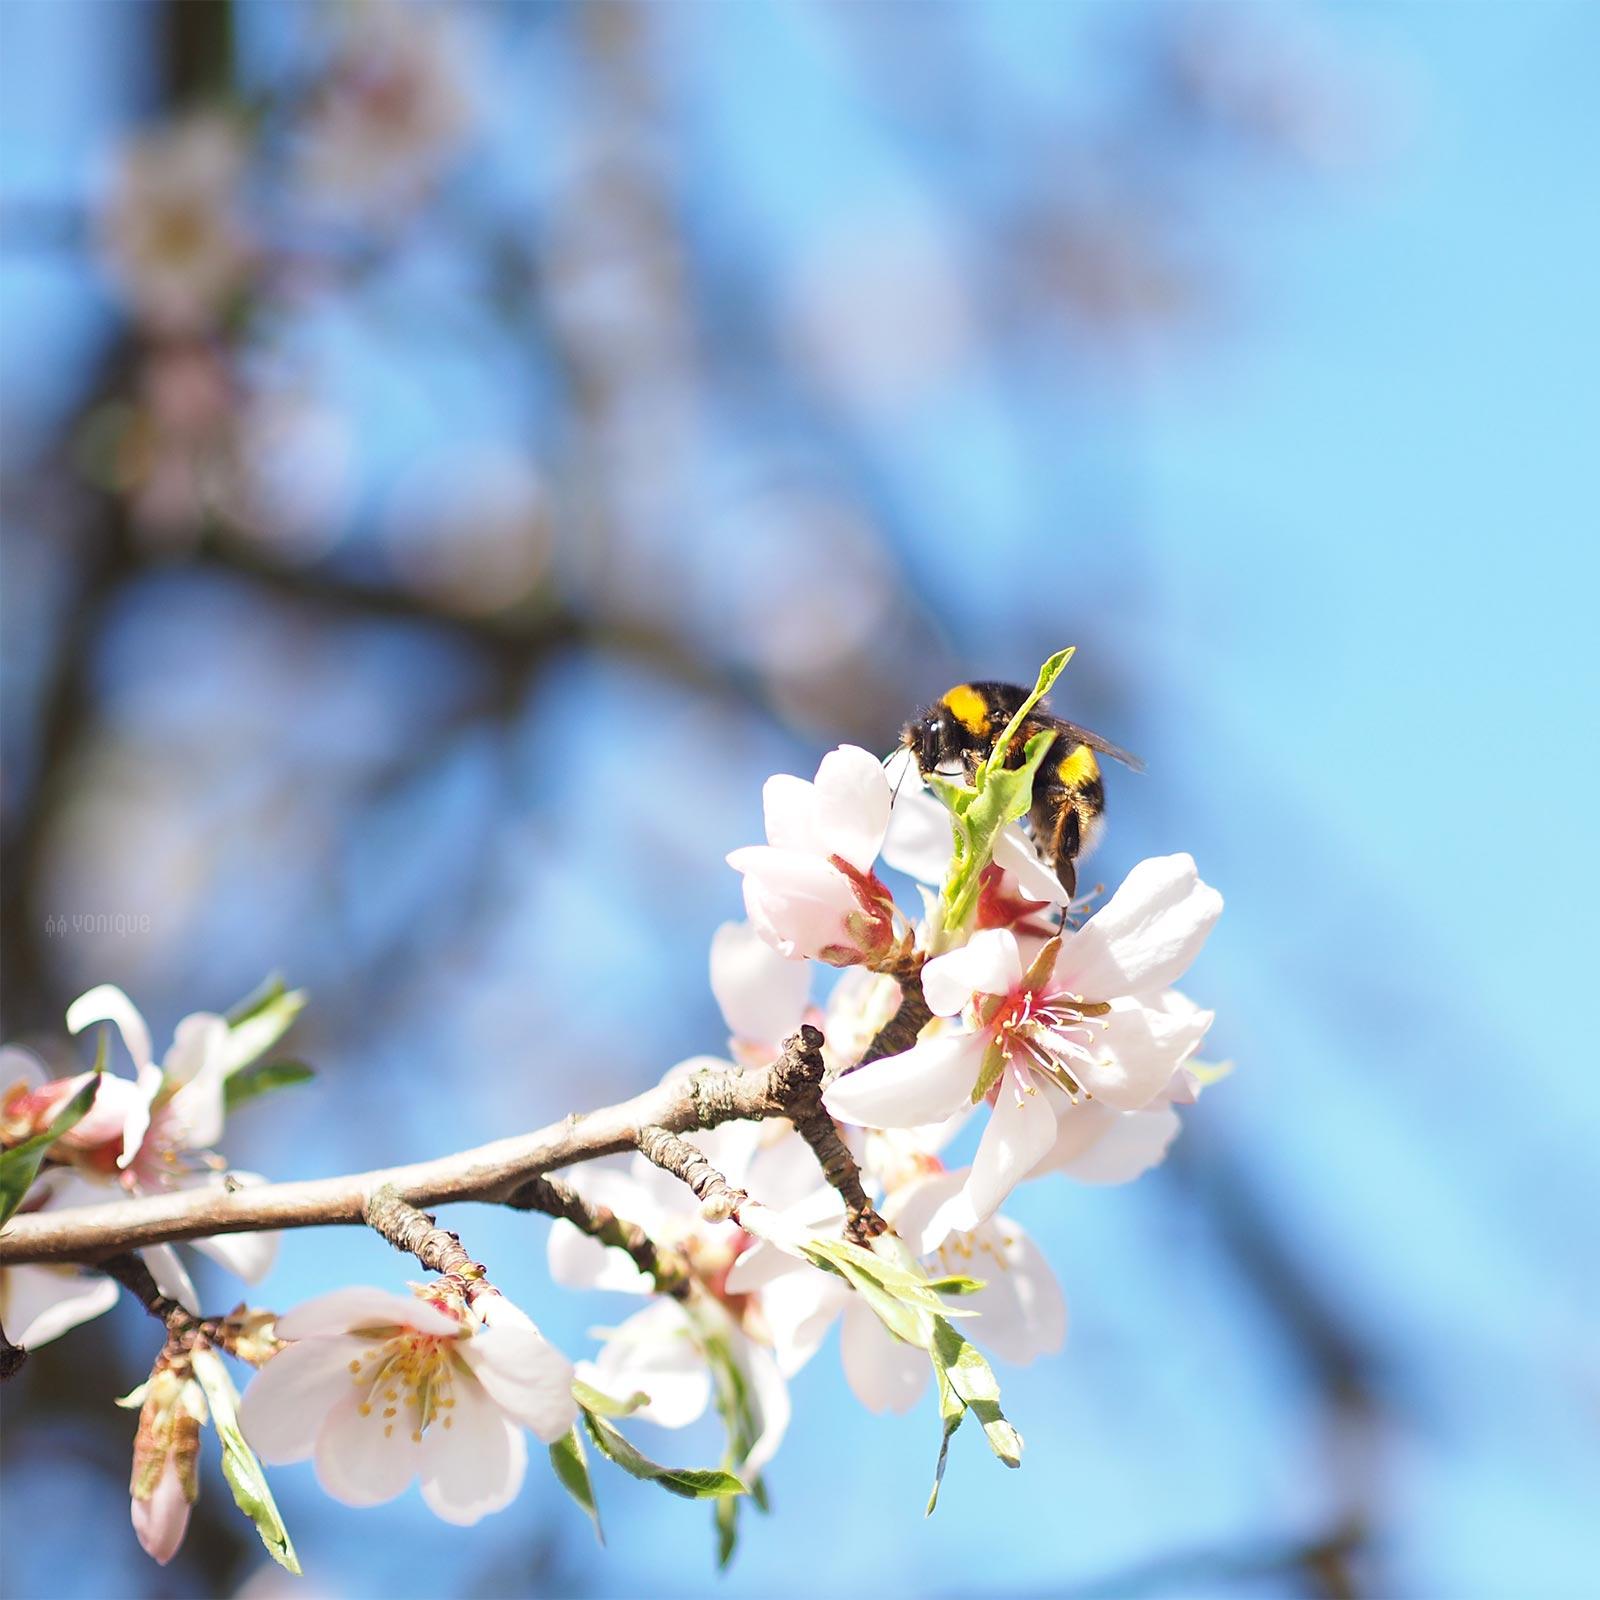 bumblebee-primavera-marzo-spring-bourdon-almon-amandier-yoniquenews